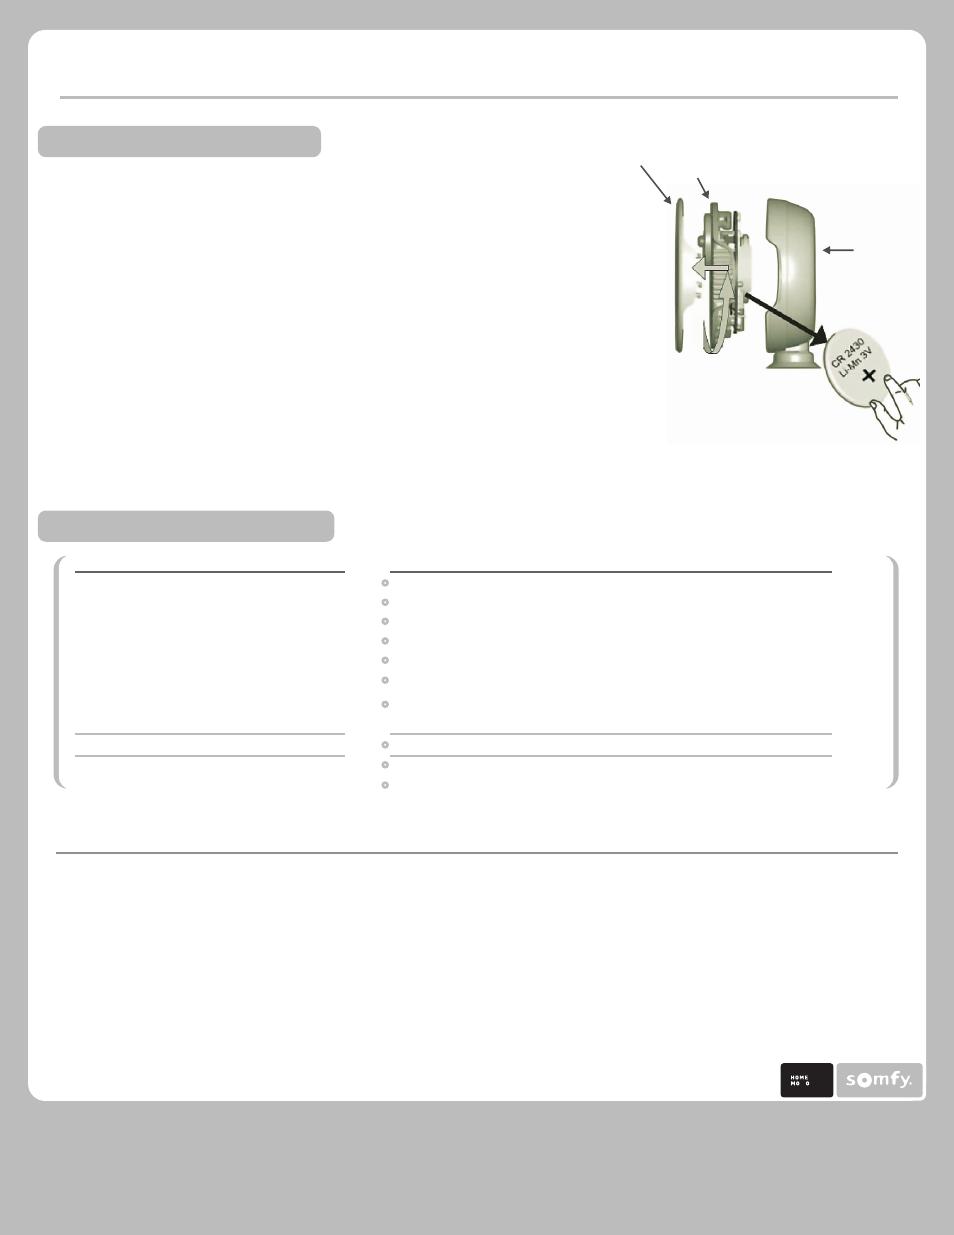 Somfy Sun Sensor Wiring Diagram on 2000 deville speed sensor wire diagram, work diagram, crankshaft position sensor diagram, lock diagram, garage door safety sensor diagram, light diagram, ntk oxygen sensor wire diagram,